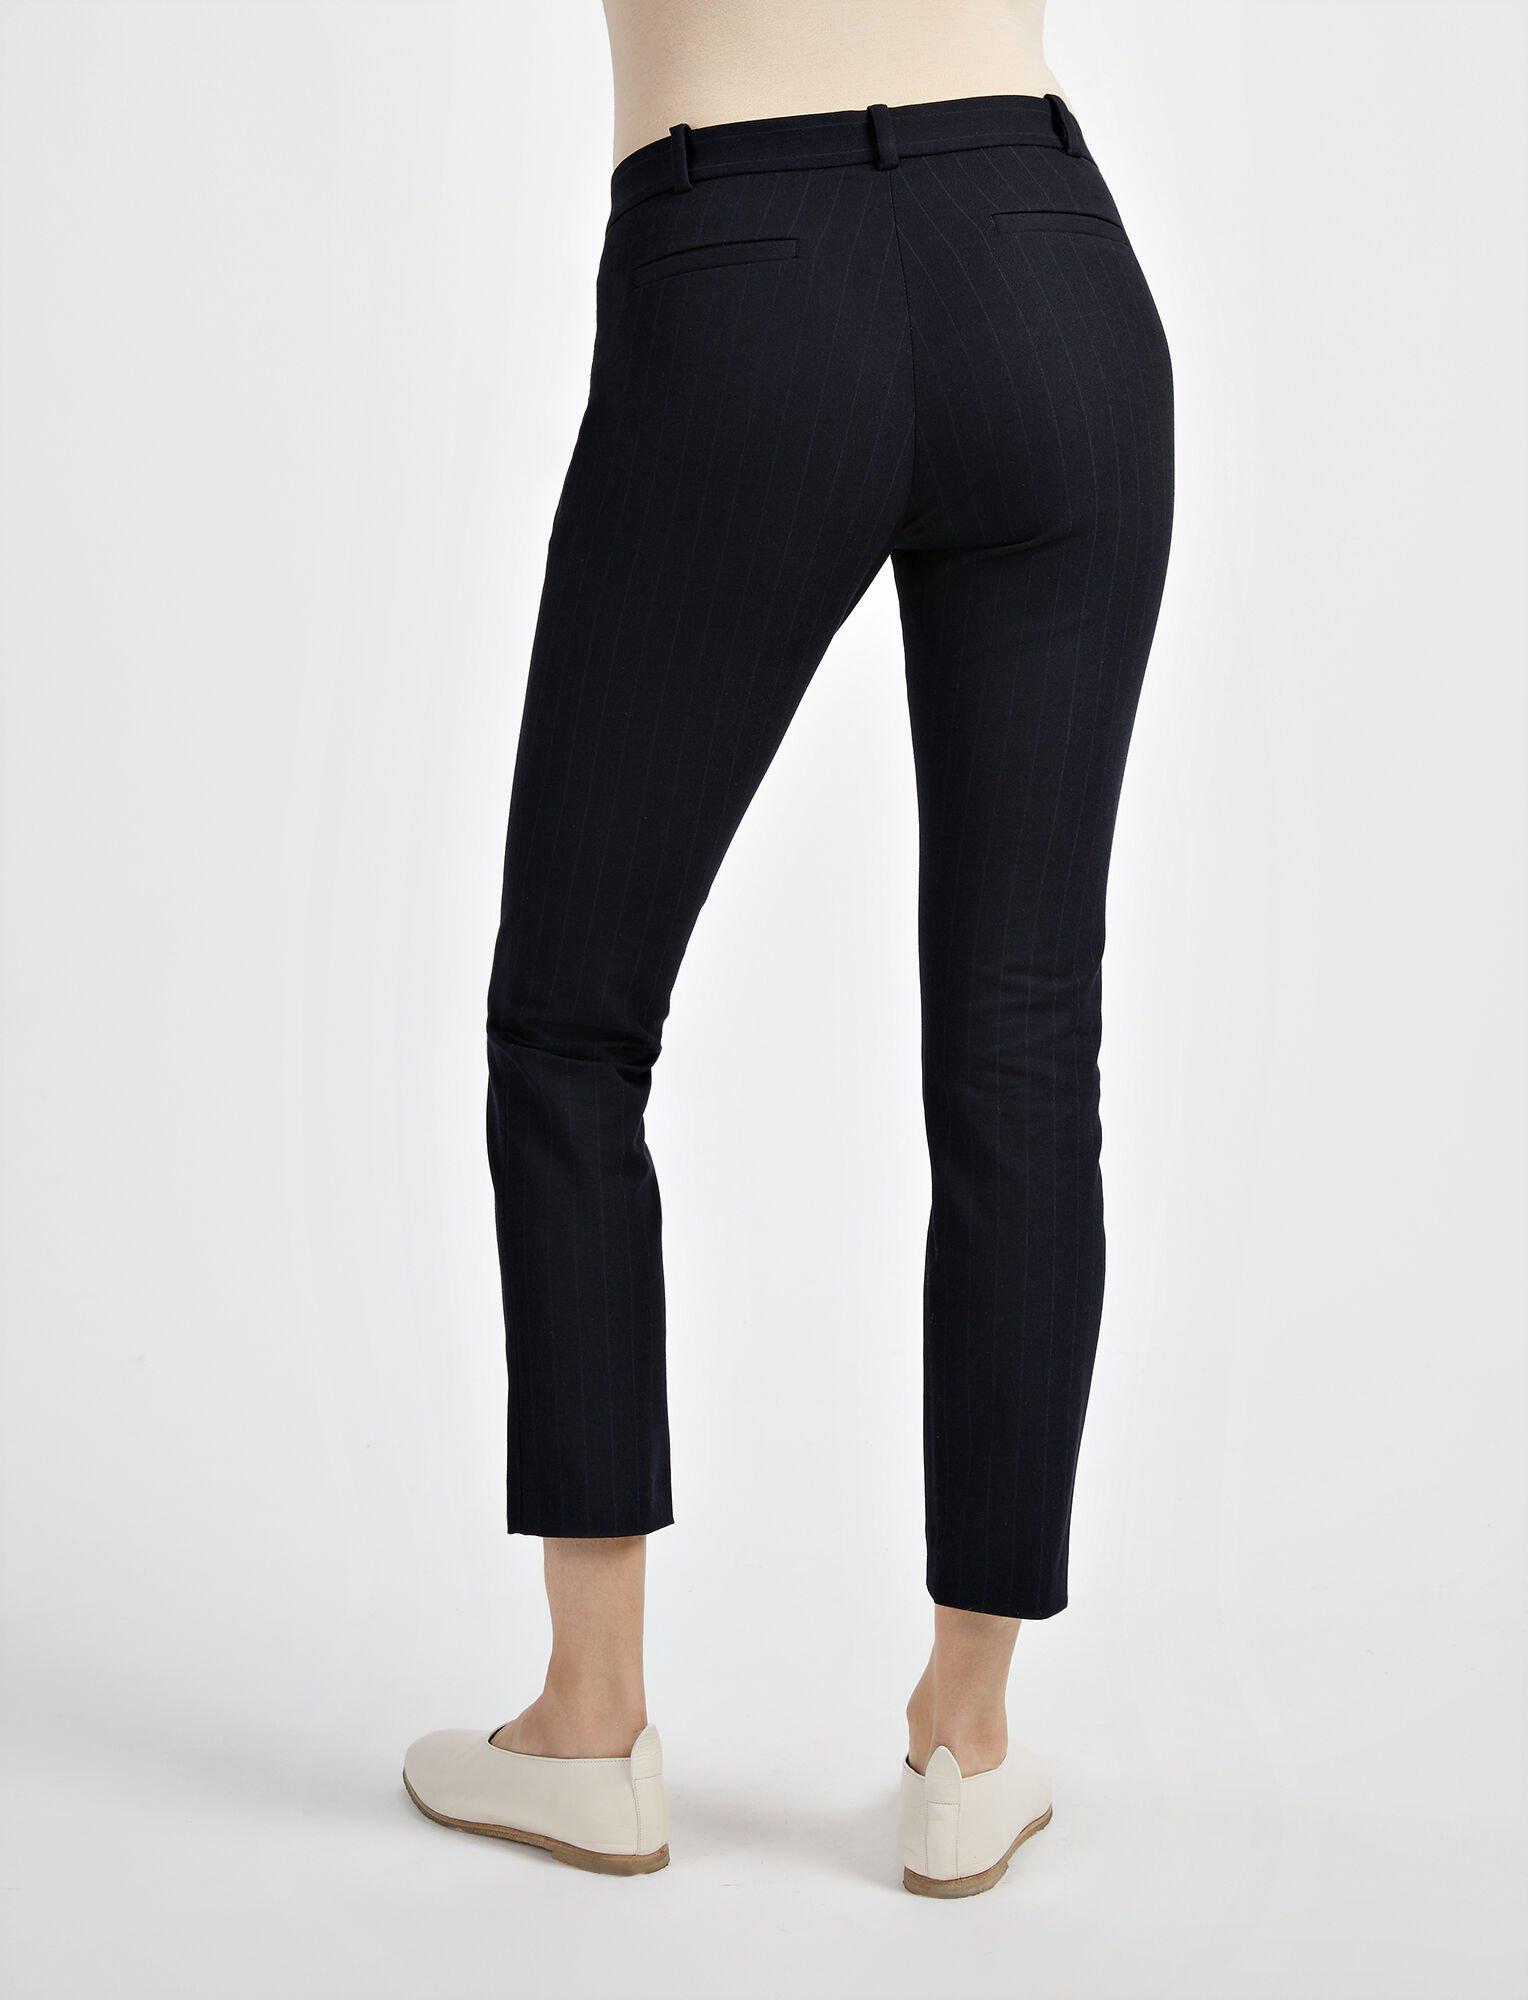 Joseph, Gabardine Stretch Jacquard New Eliston Trouser, in NAVY